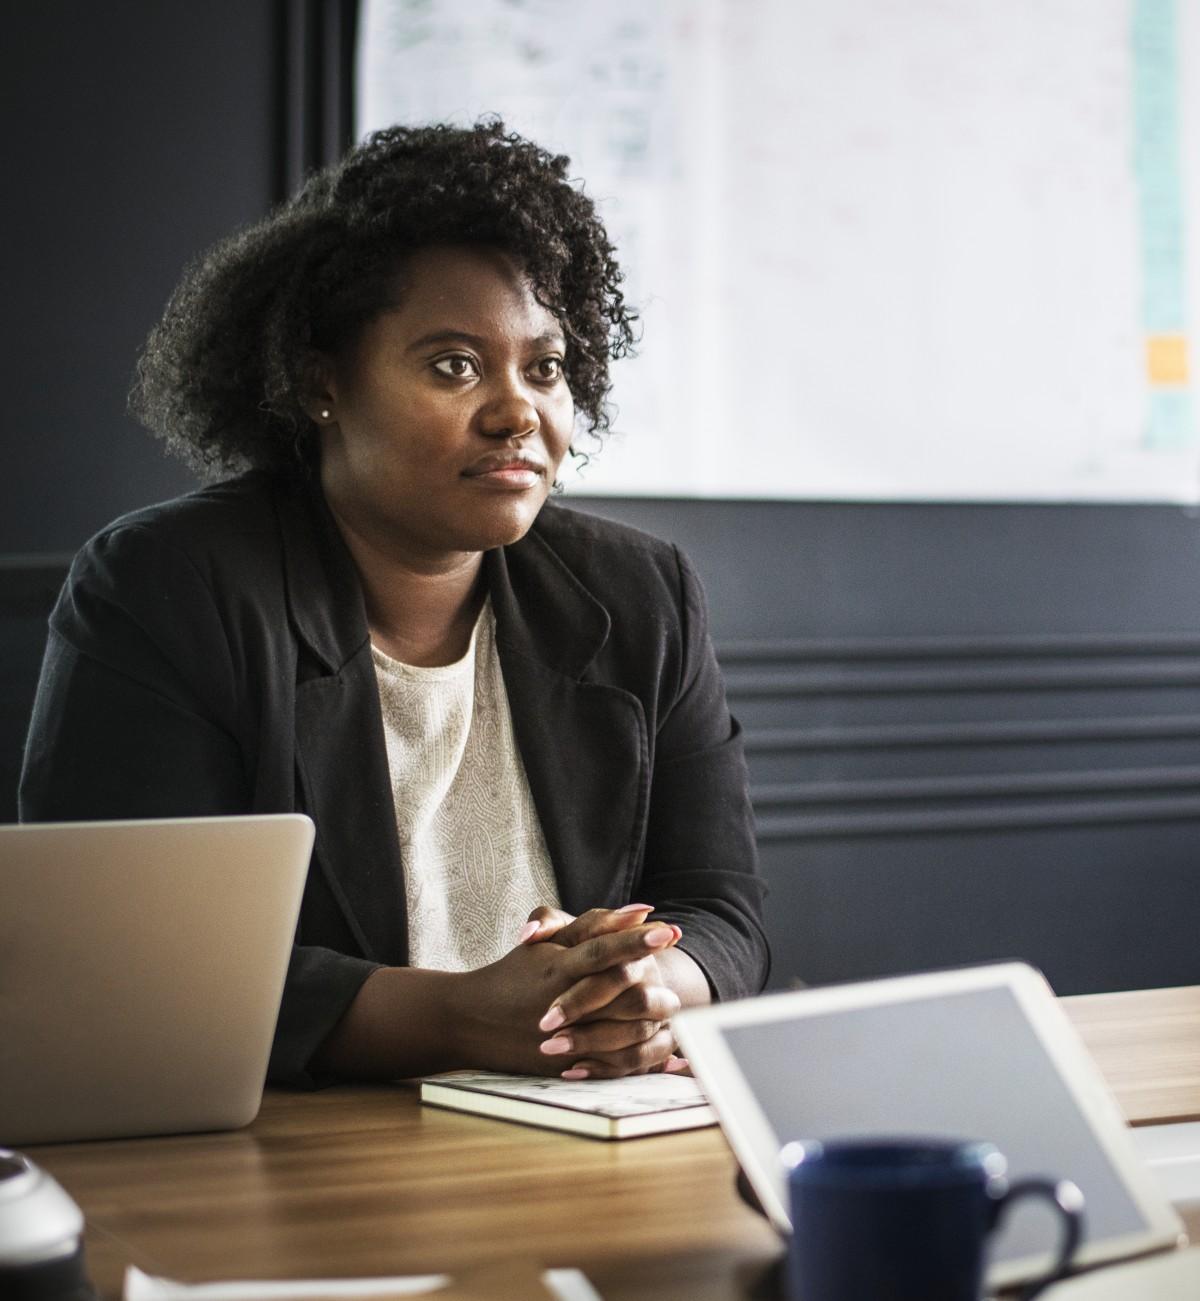 International PR firm launches an African female mentorship programme